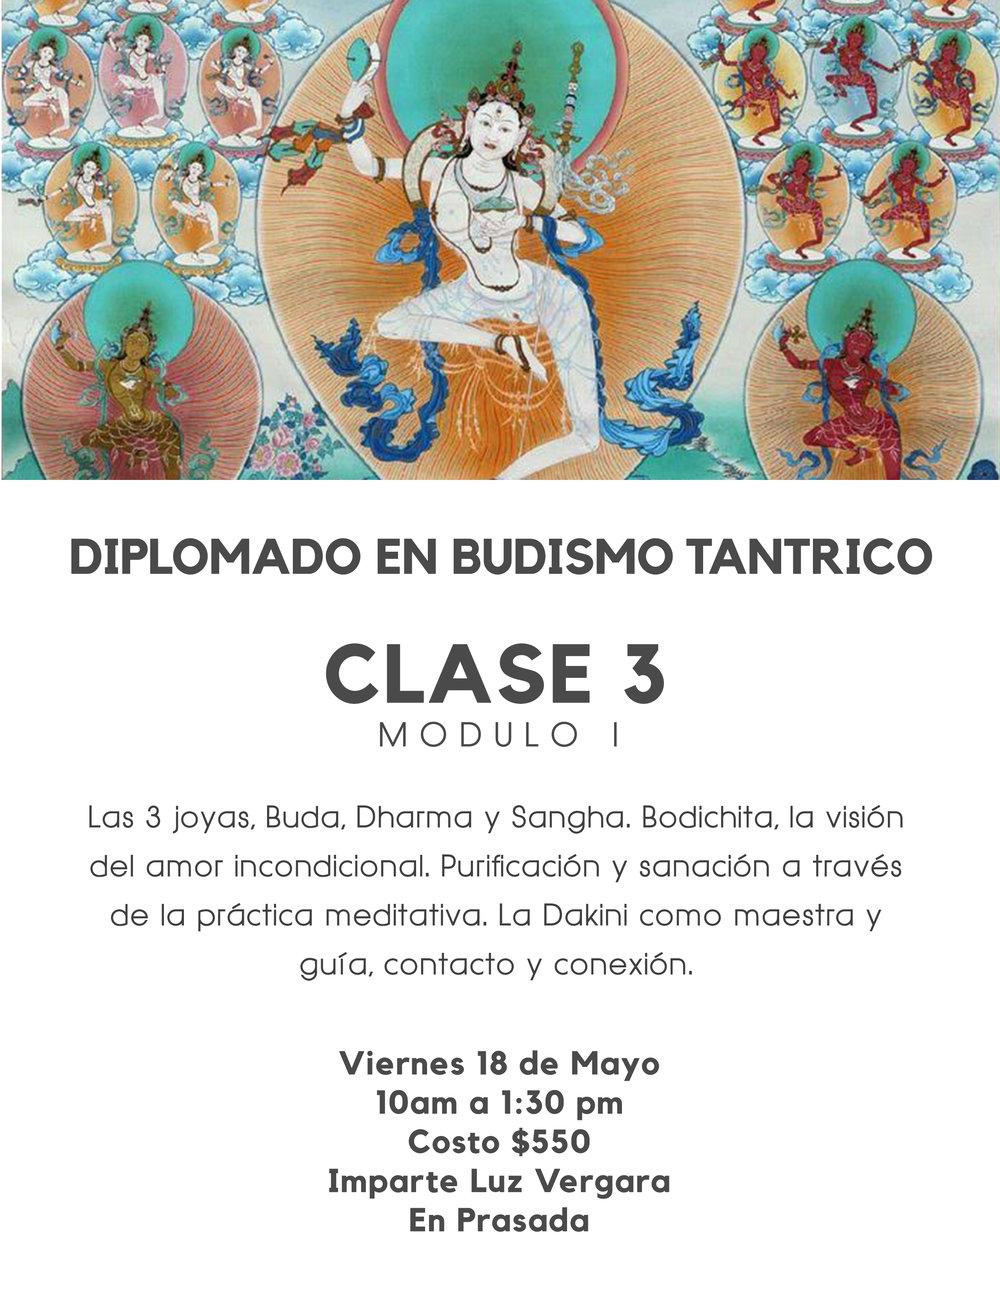 clase3_budismo.jpg